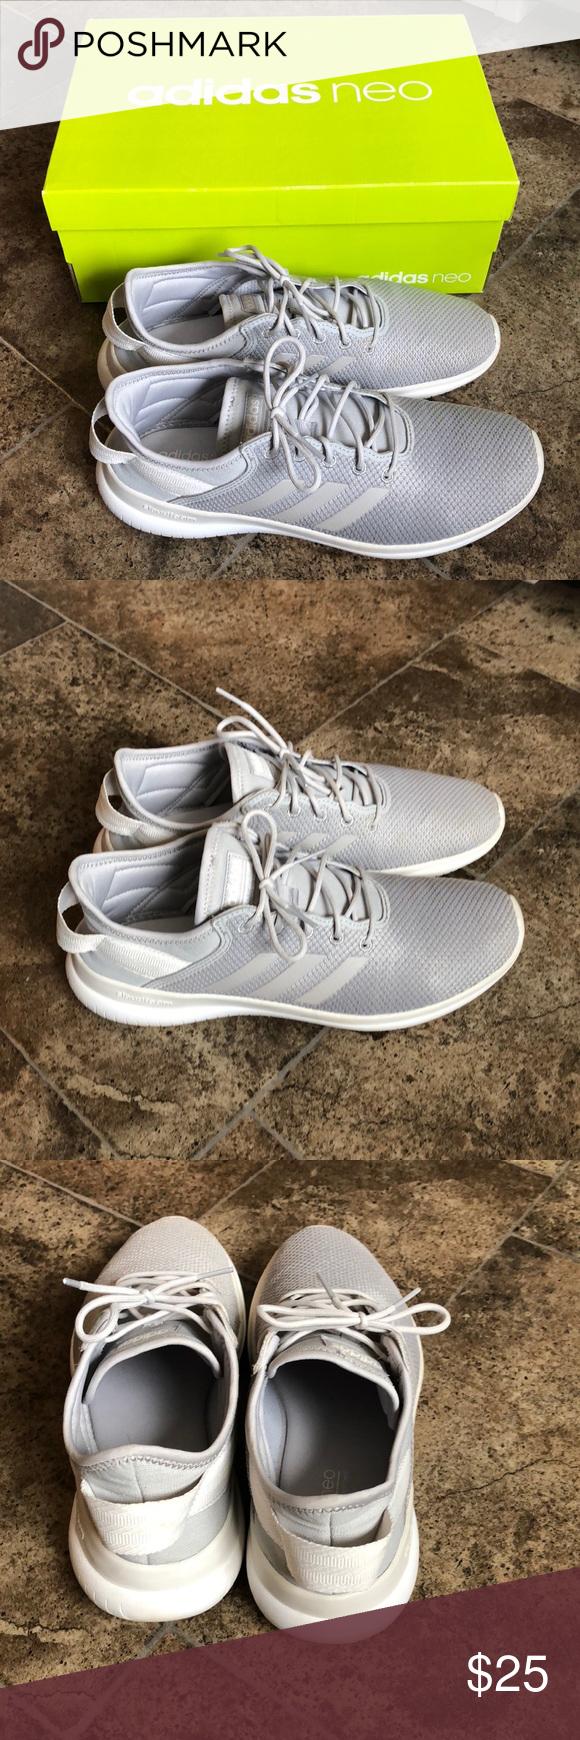 adidas neo cloudfoam qtflex scarpe, scarpe da ginnastica, le adidas